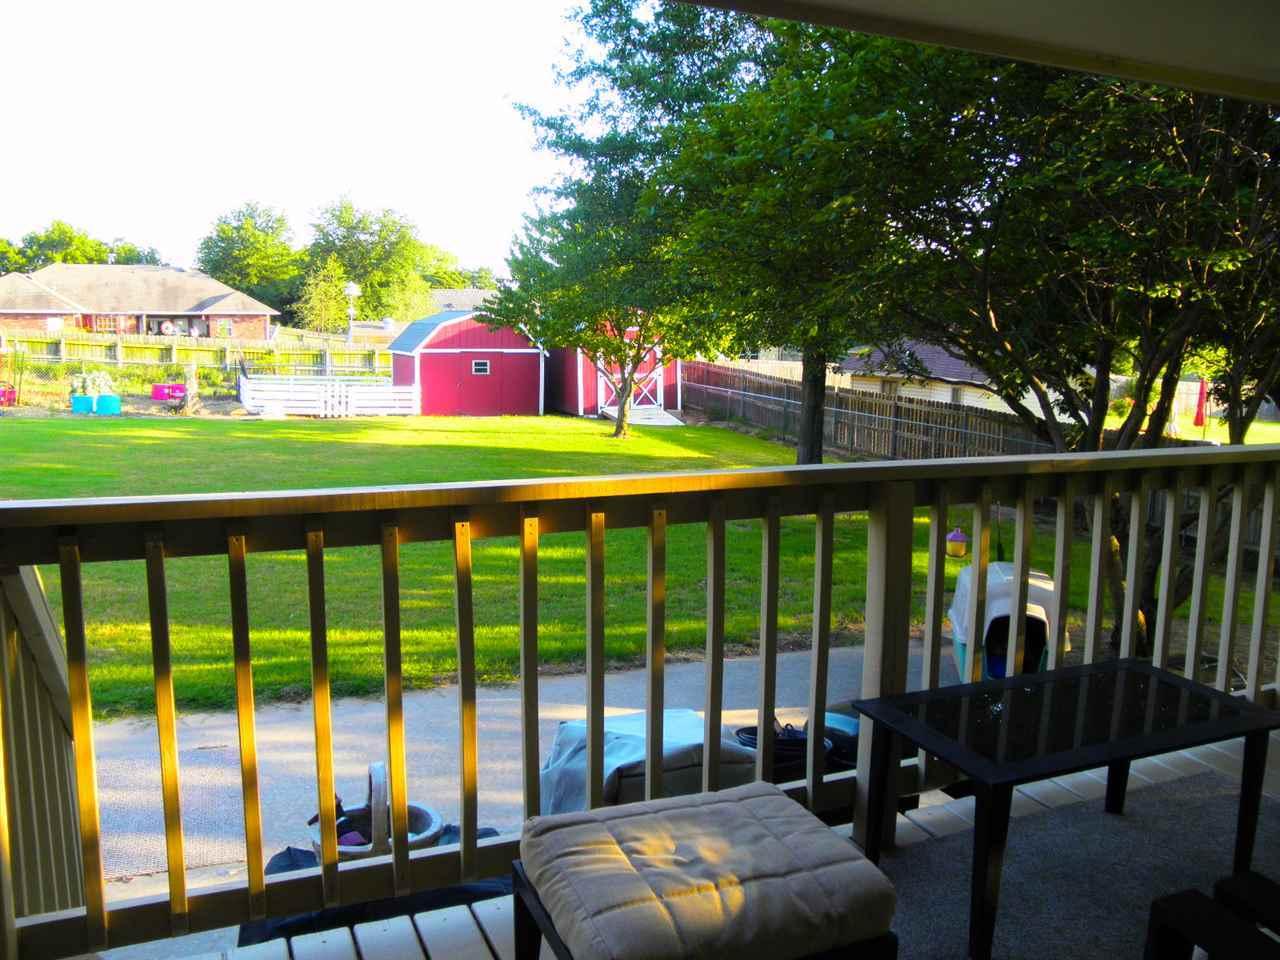 Sold Cross Sale W/ MLS | 32 Raintree Ponca City, OK 74604 31